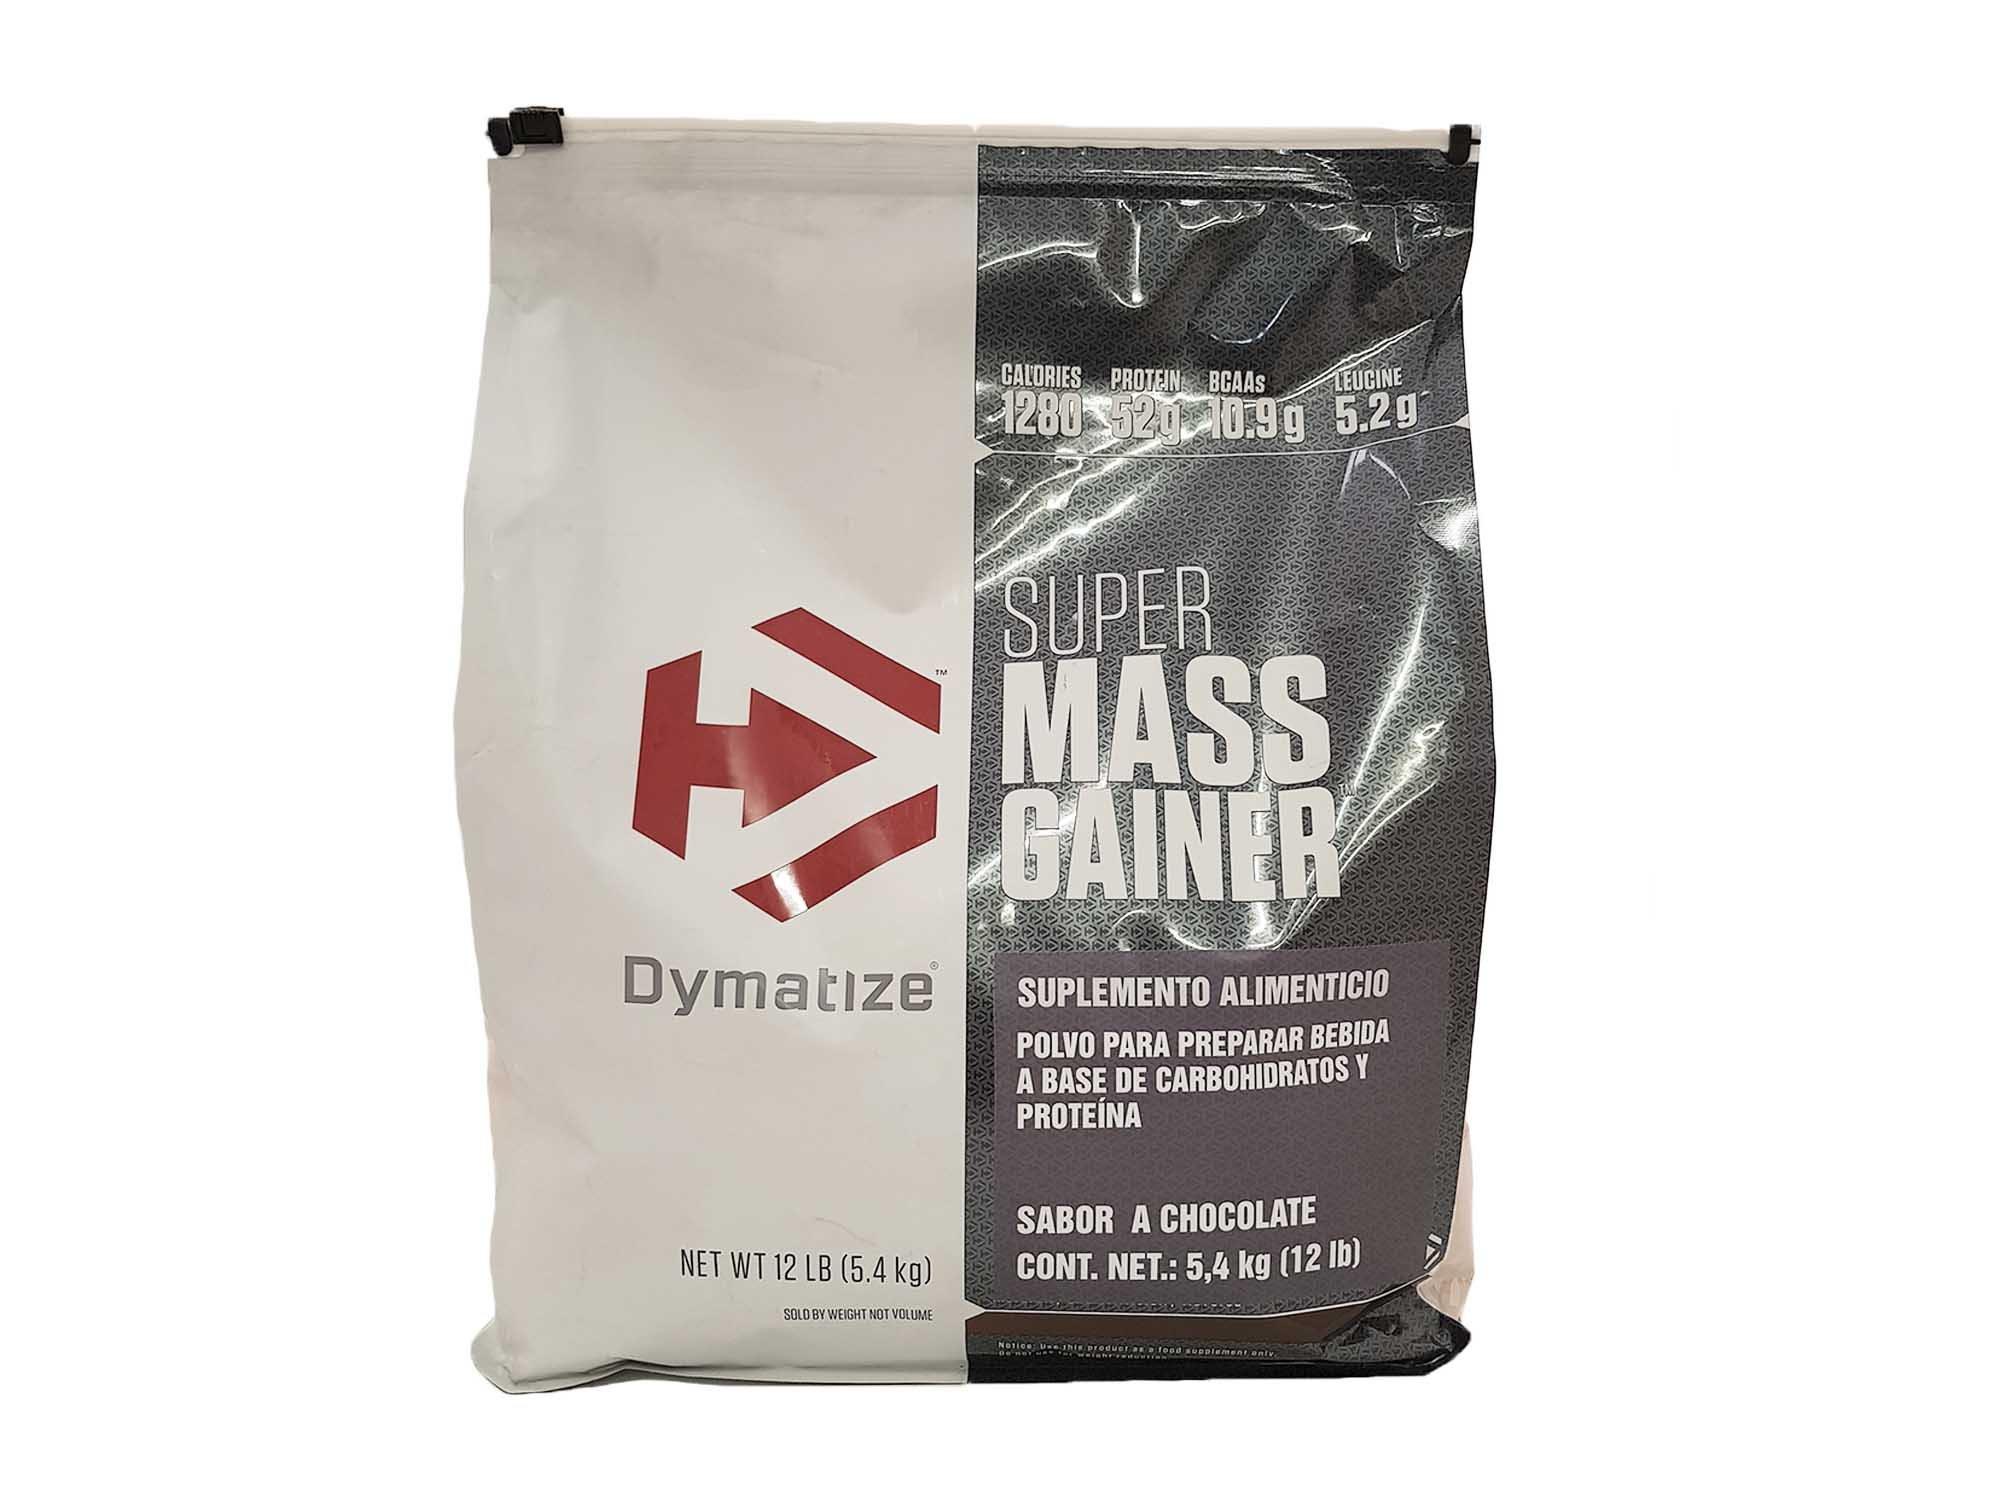 Dymatize Nutrition Super Mega Gainer, Hardcore Chocolate, 12 Pound